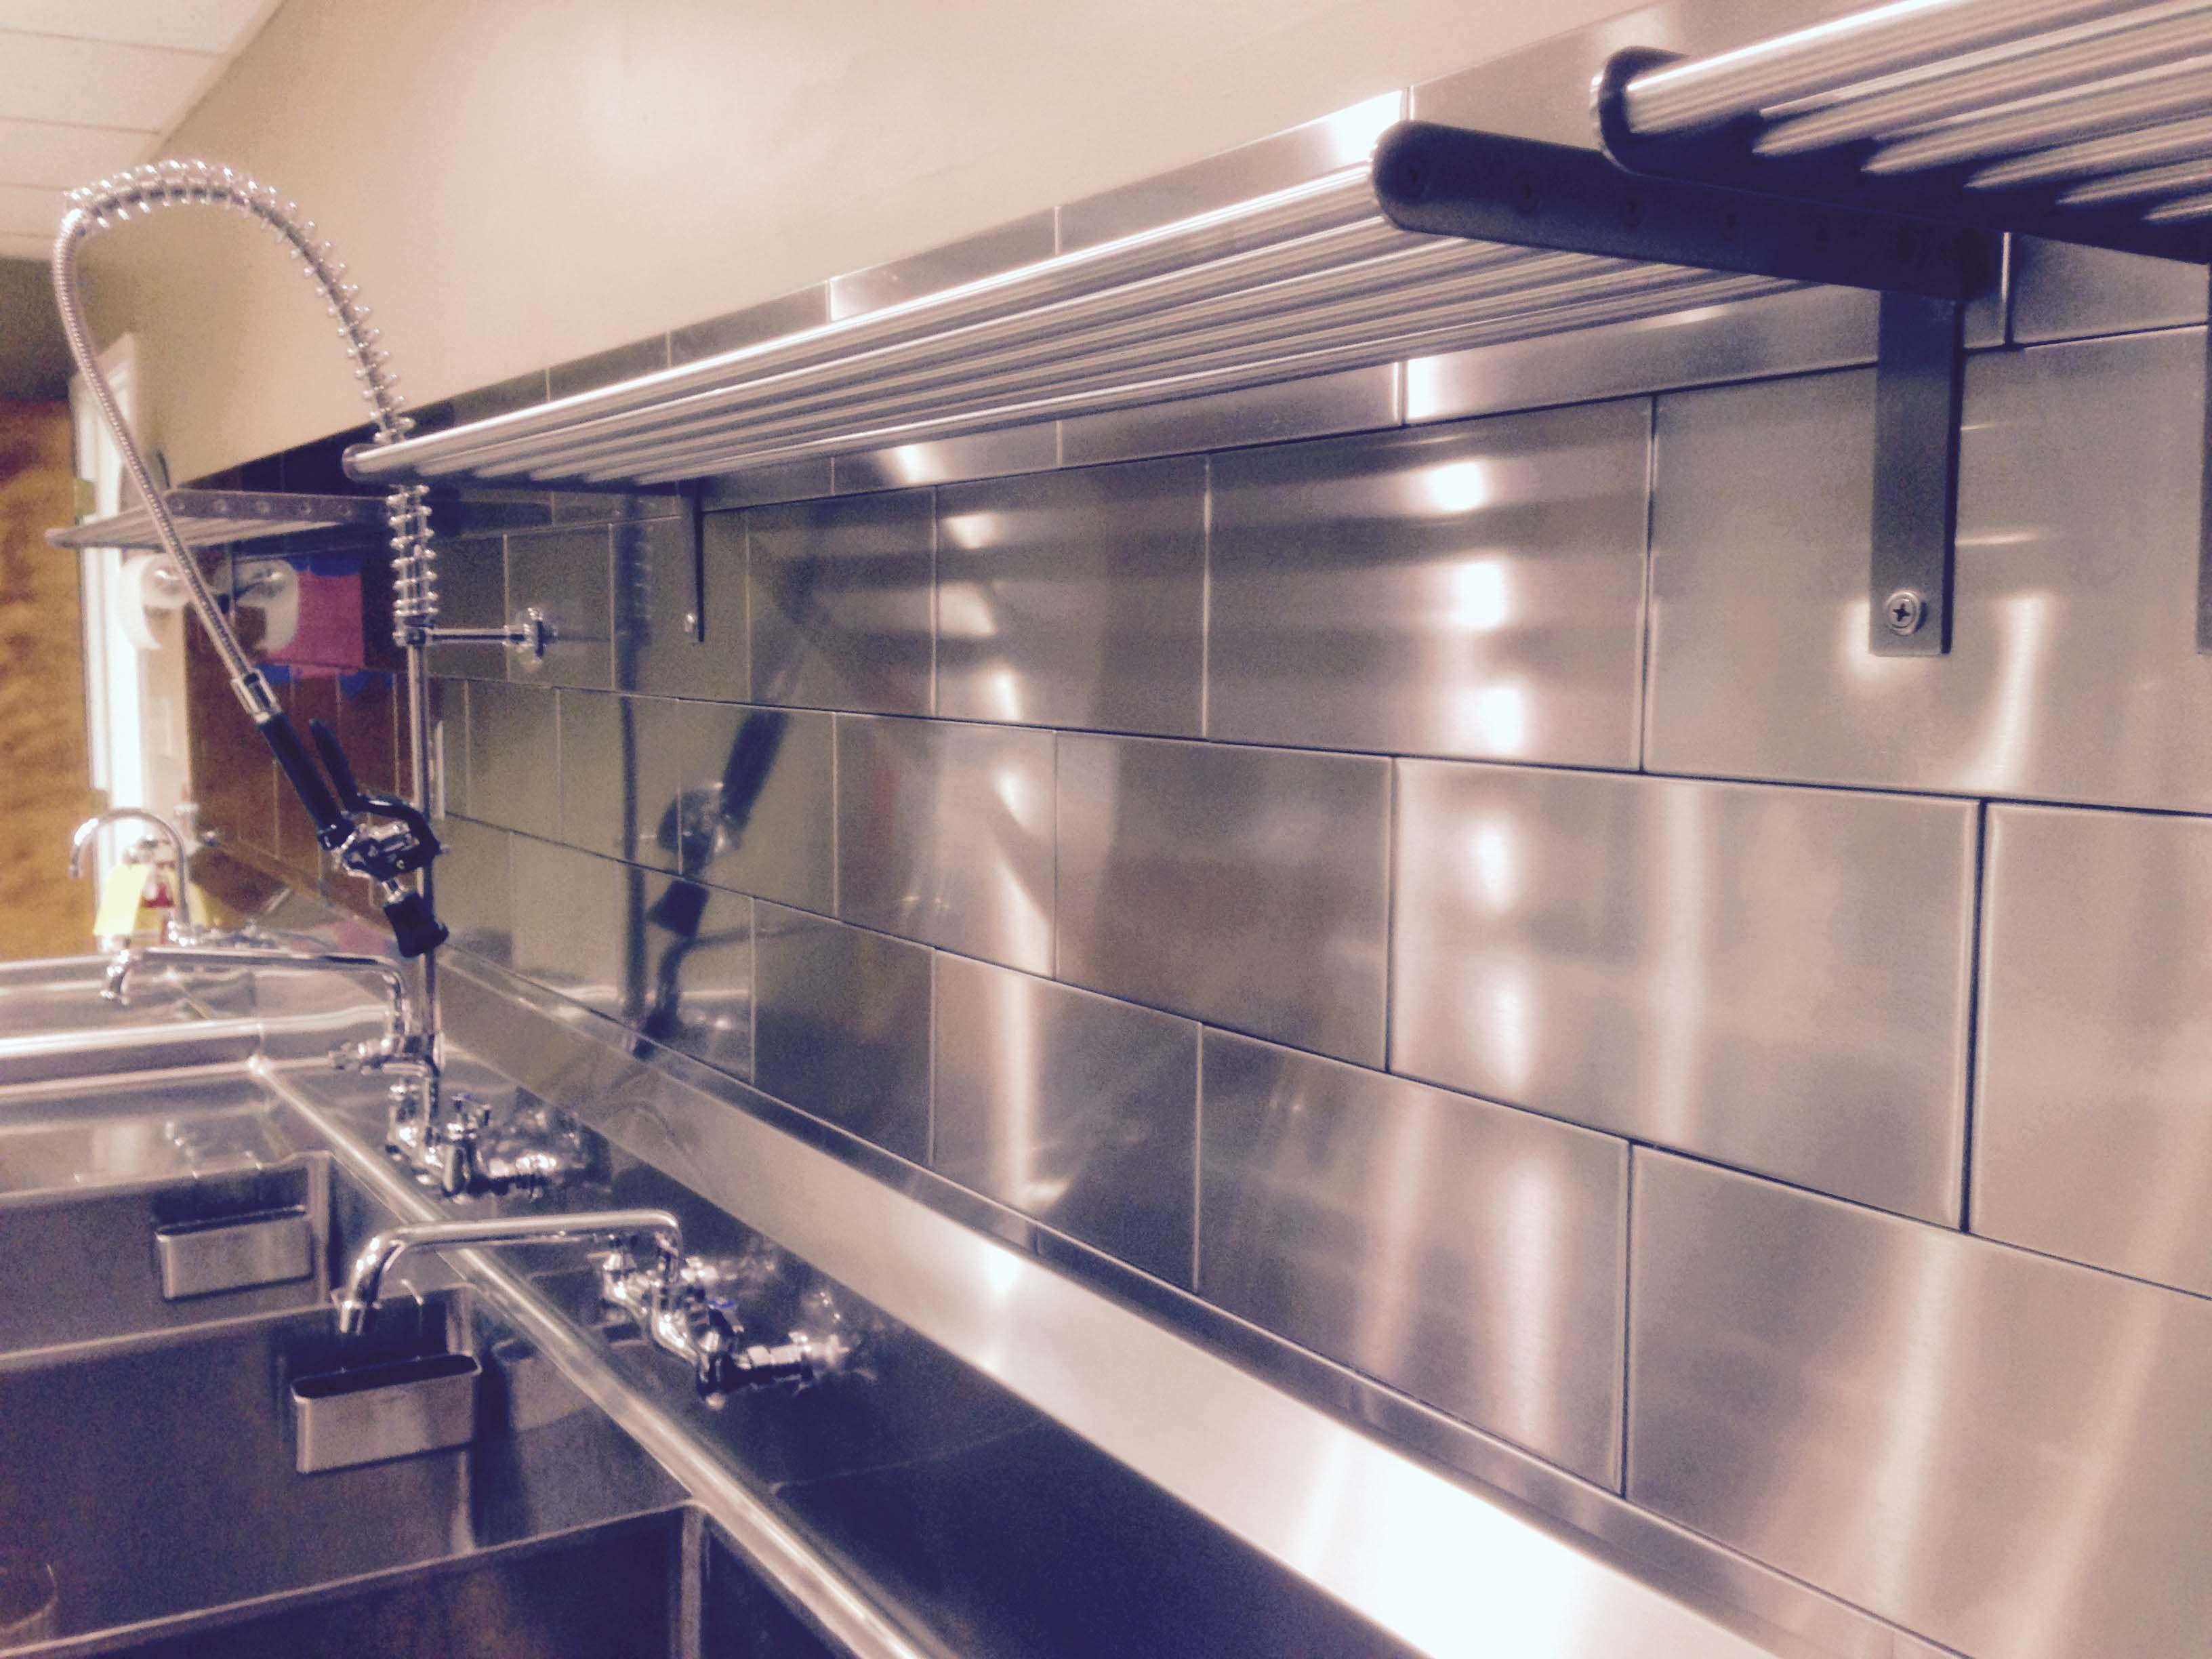 Commercial Kitchen Design Stainless Steel Tile Backsplash In Church Kitchen Http Www